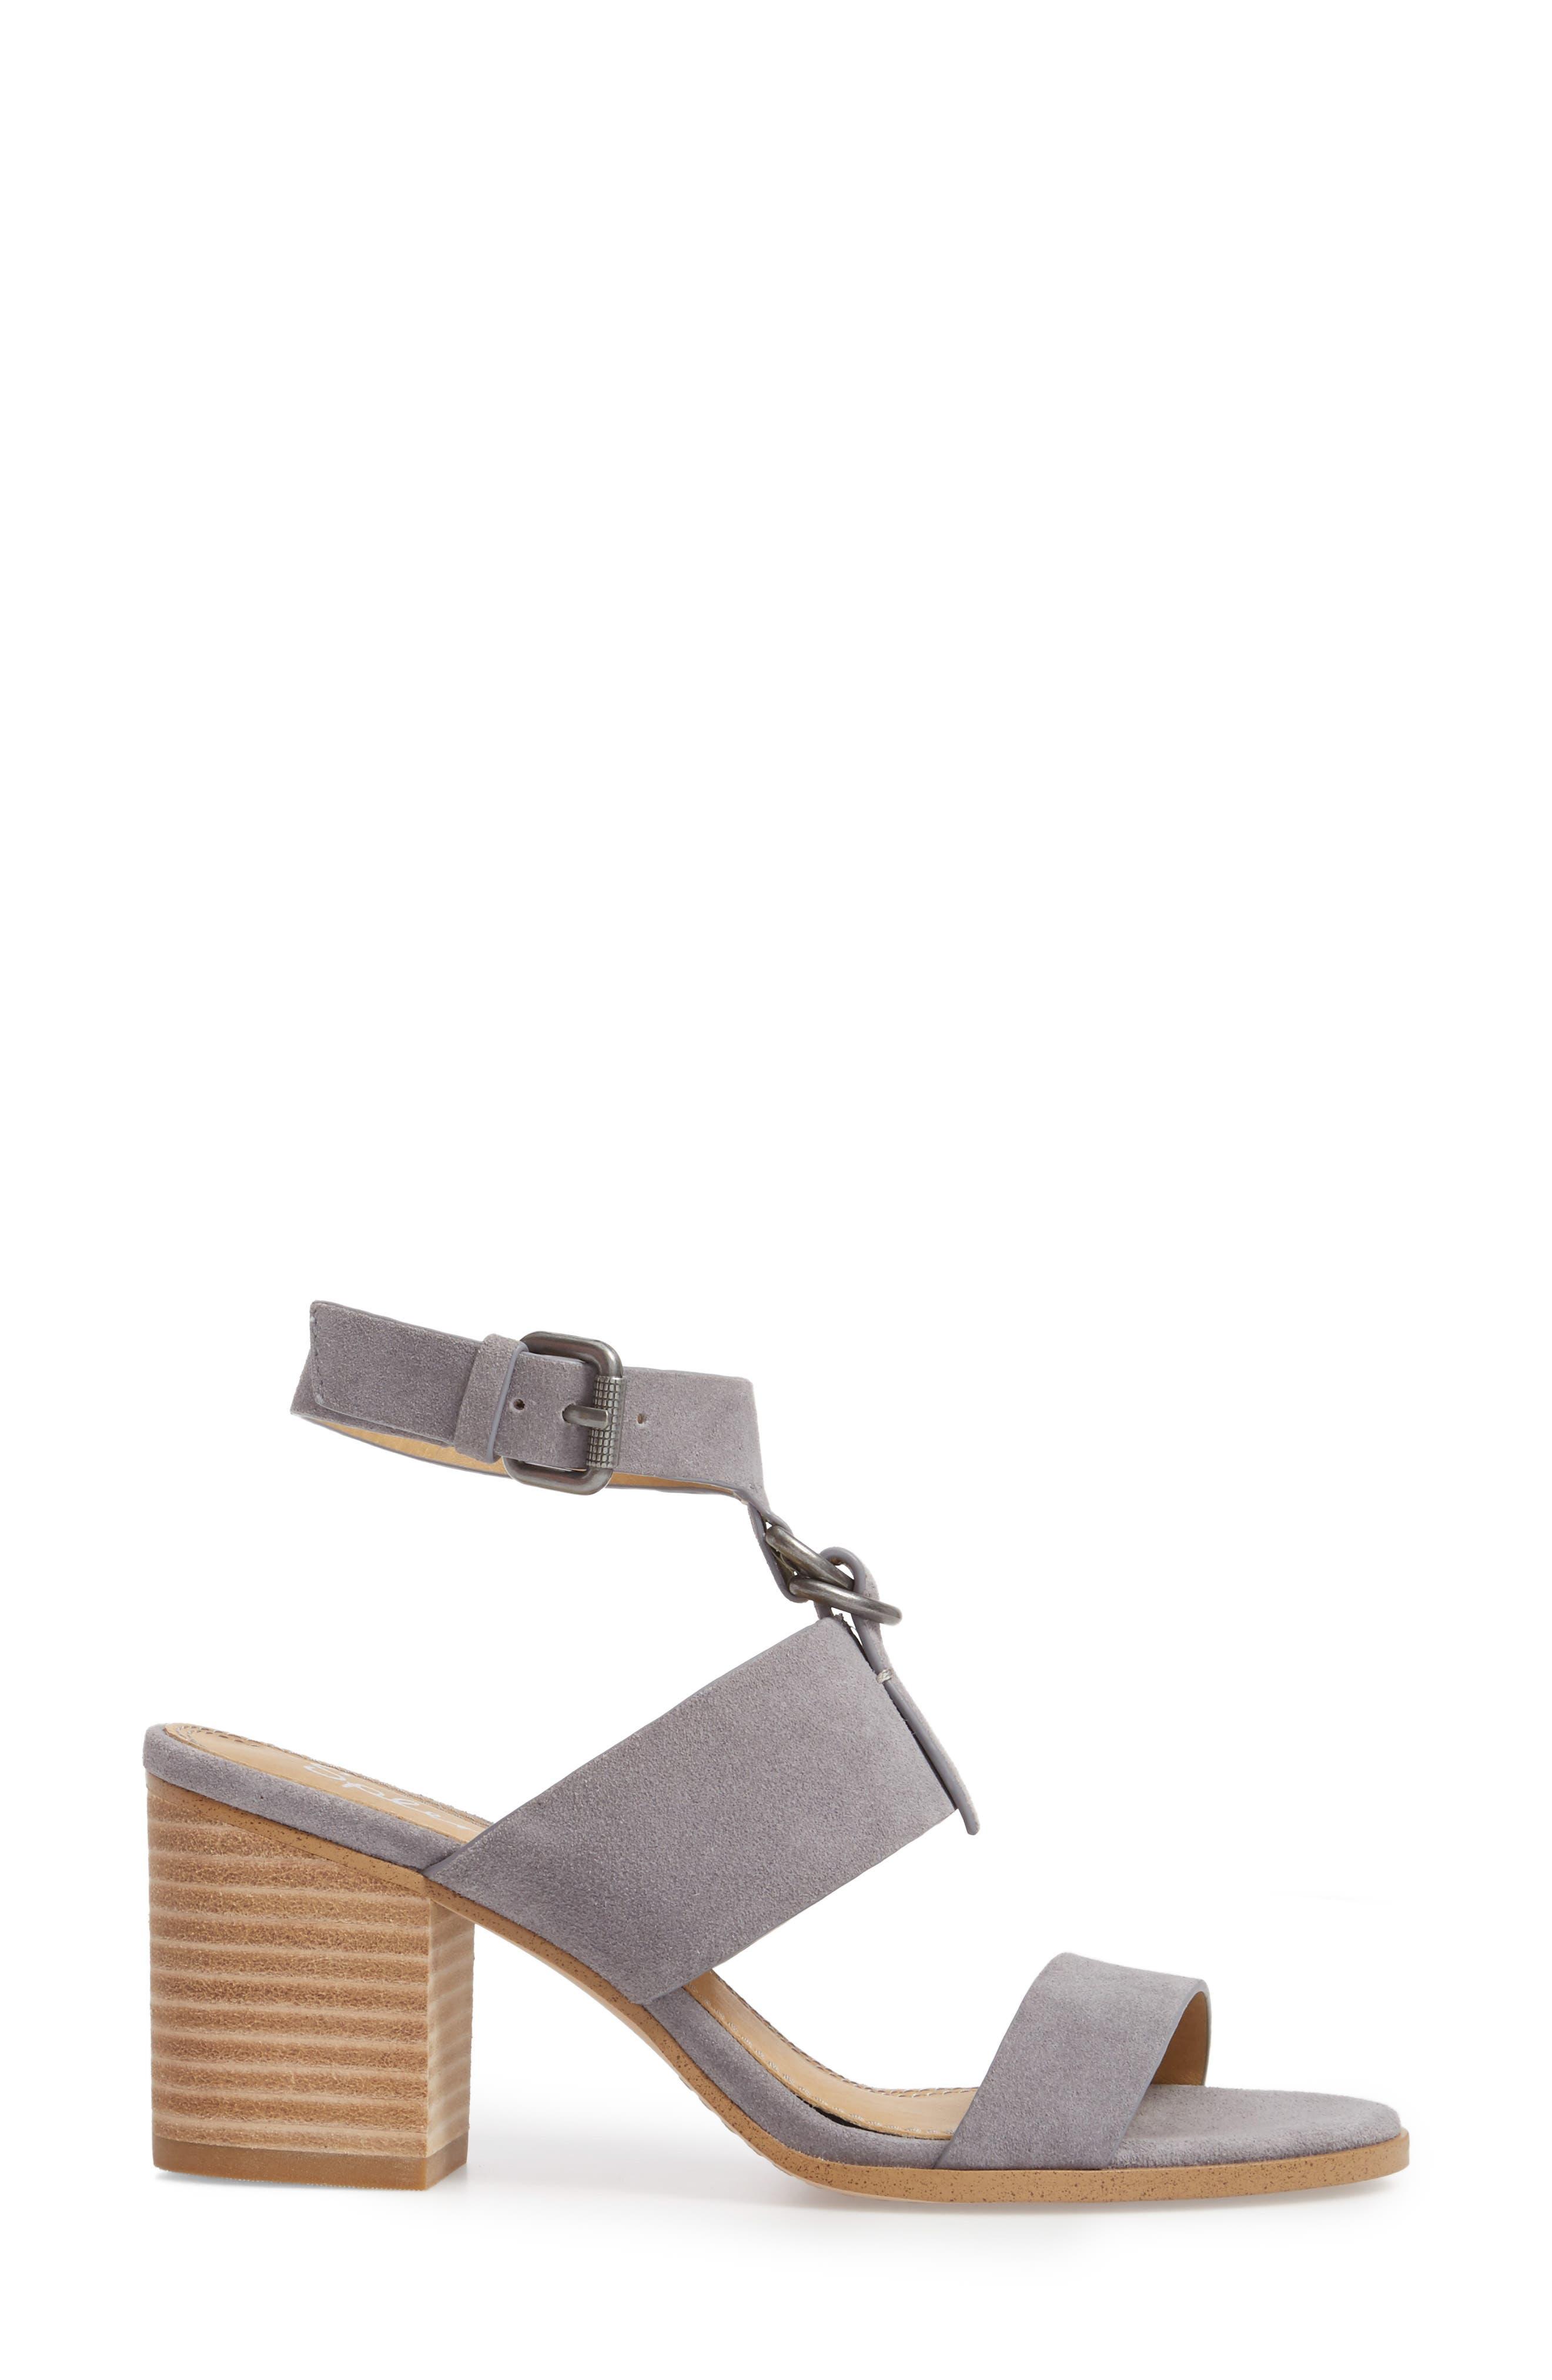 Faron Block Heel Sandal,                             Alternate thumbnail 8, color,